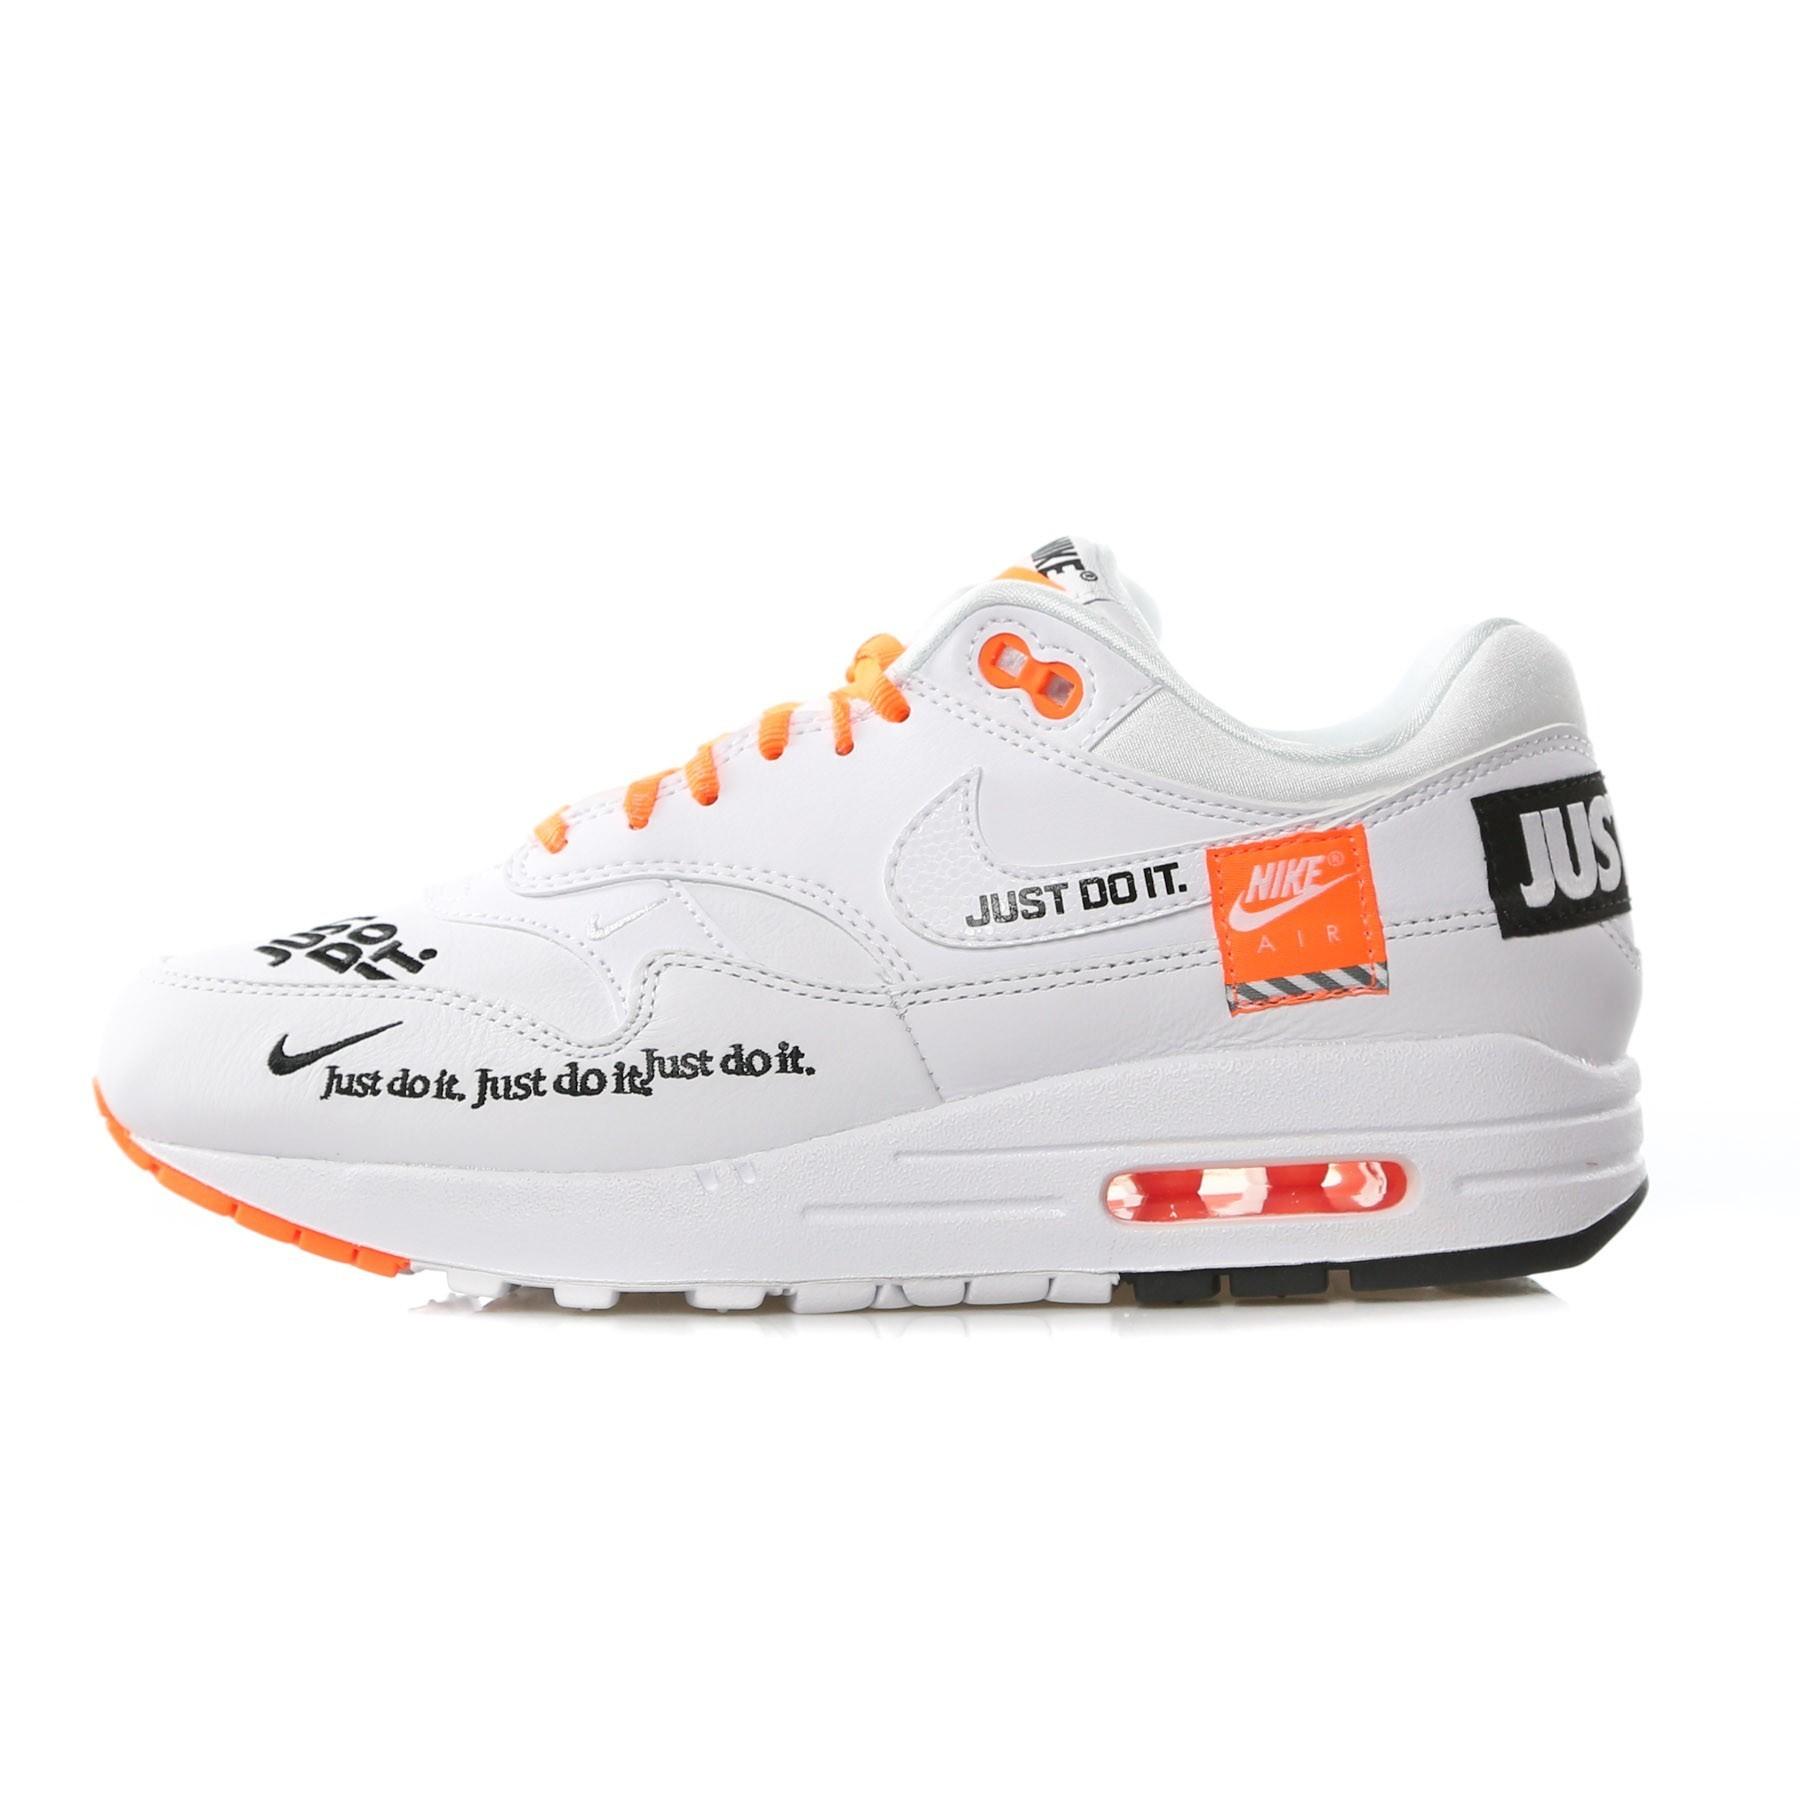 Nike Air Max 1 Just Do It Pack Orange Womens